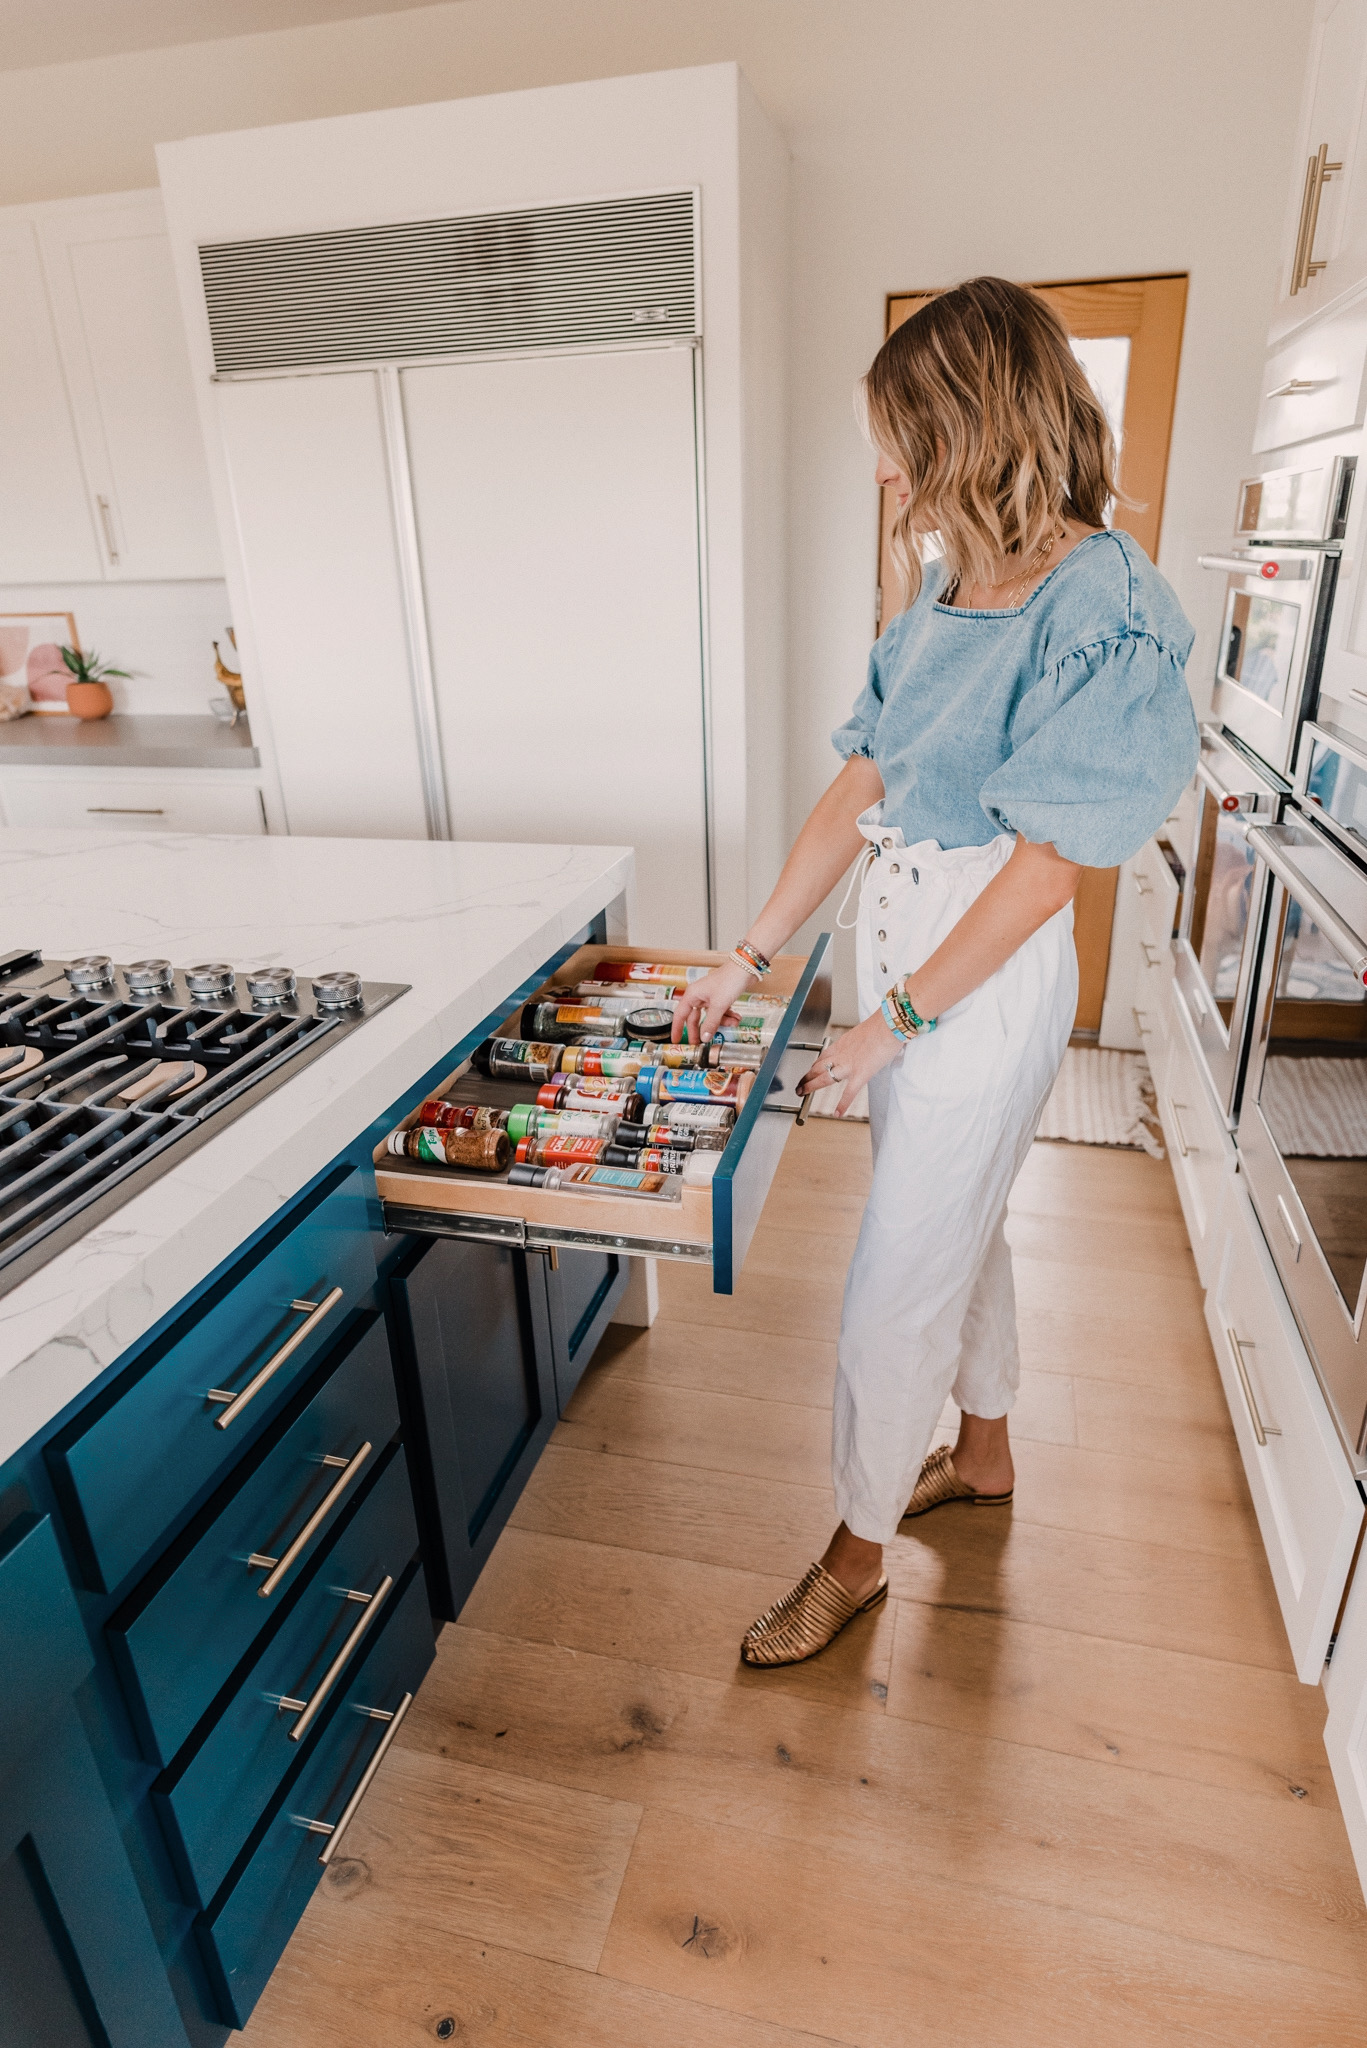 Best Home Organization Tips for Kitchen